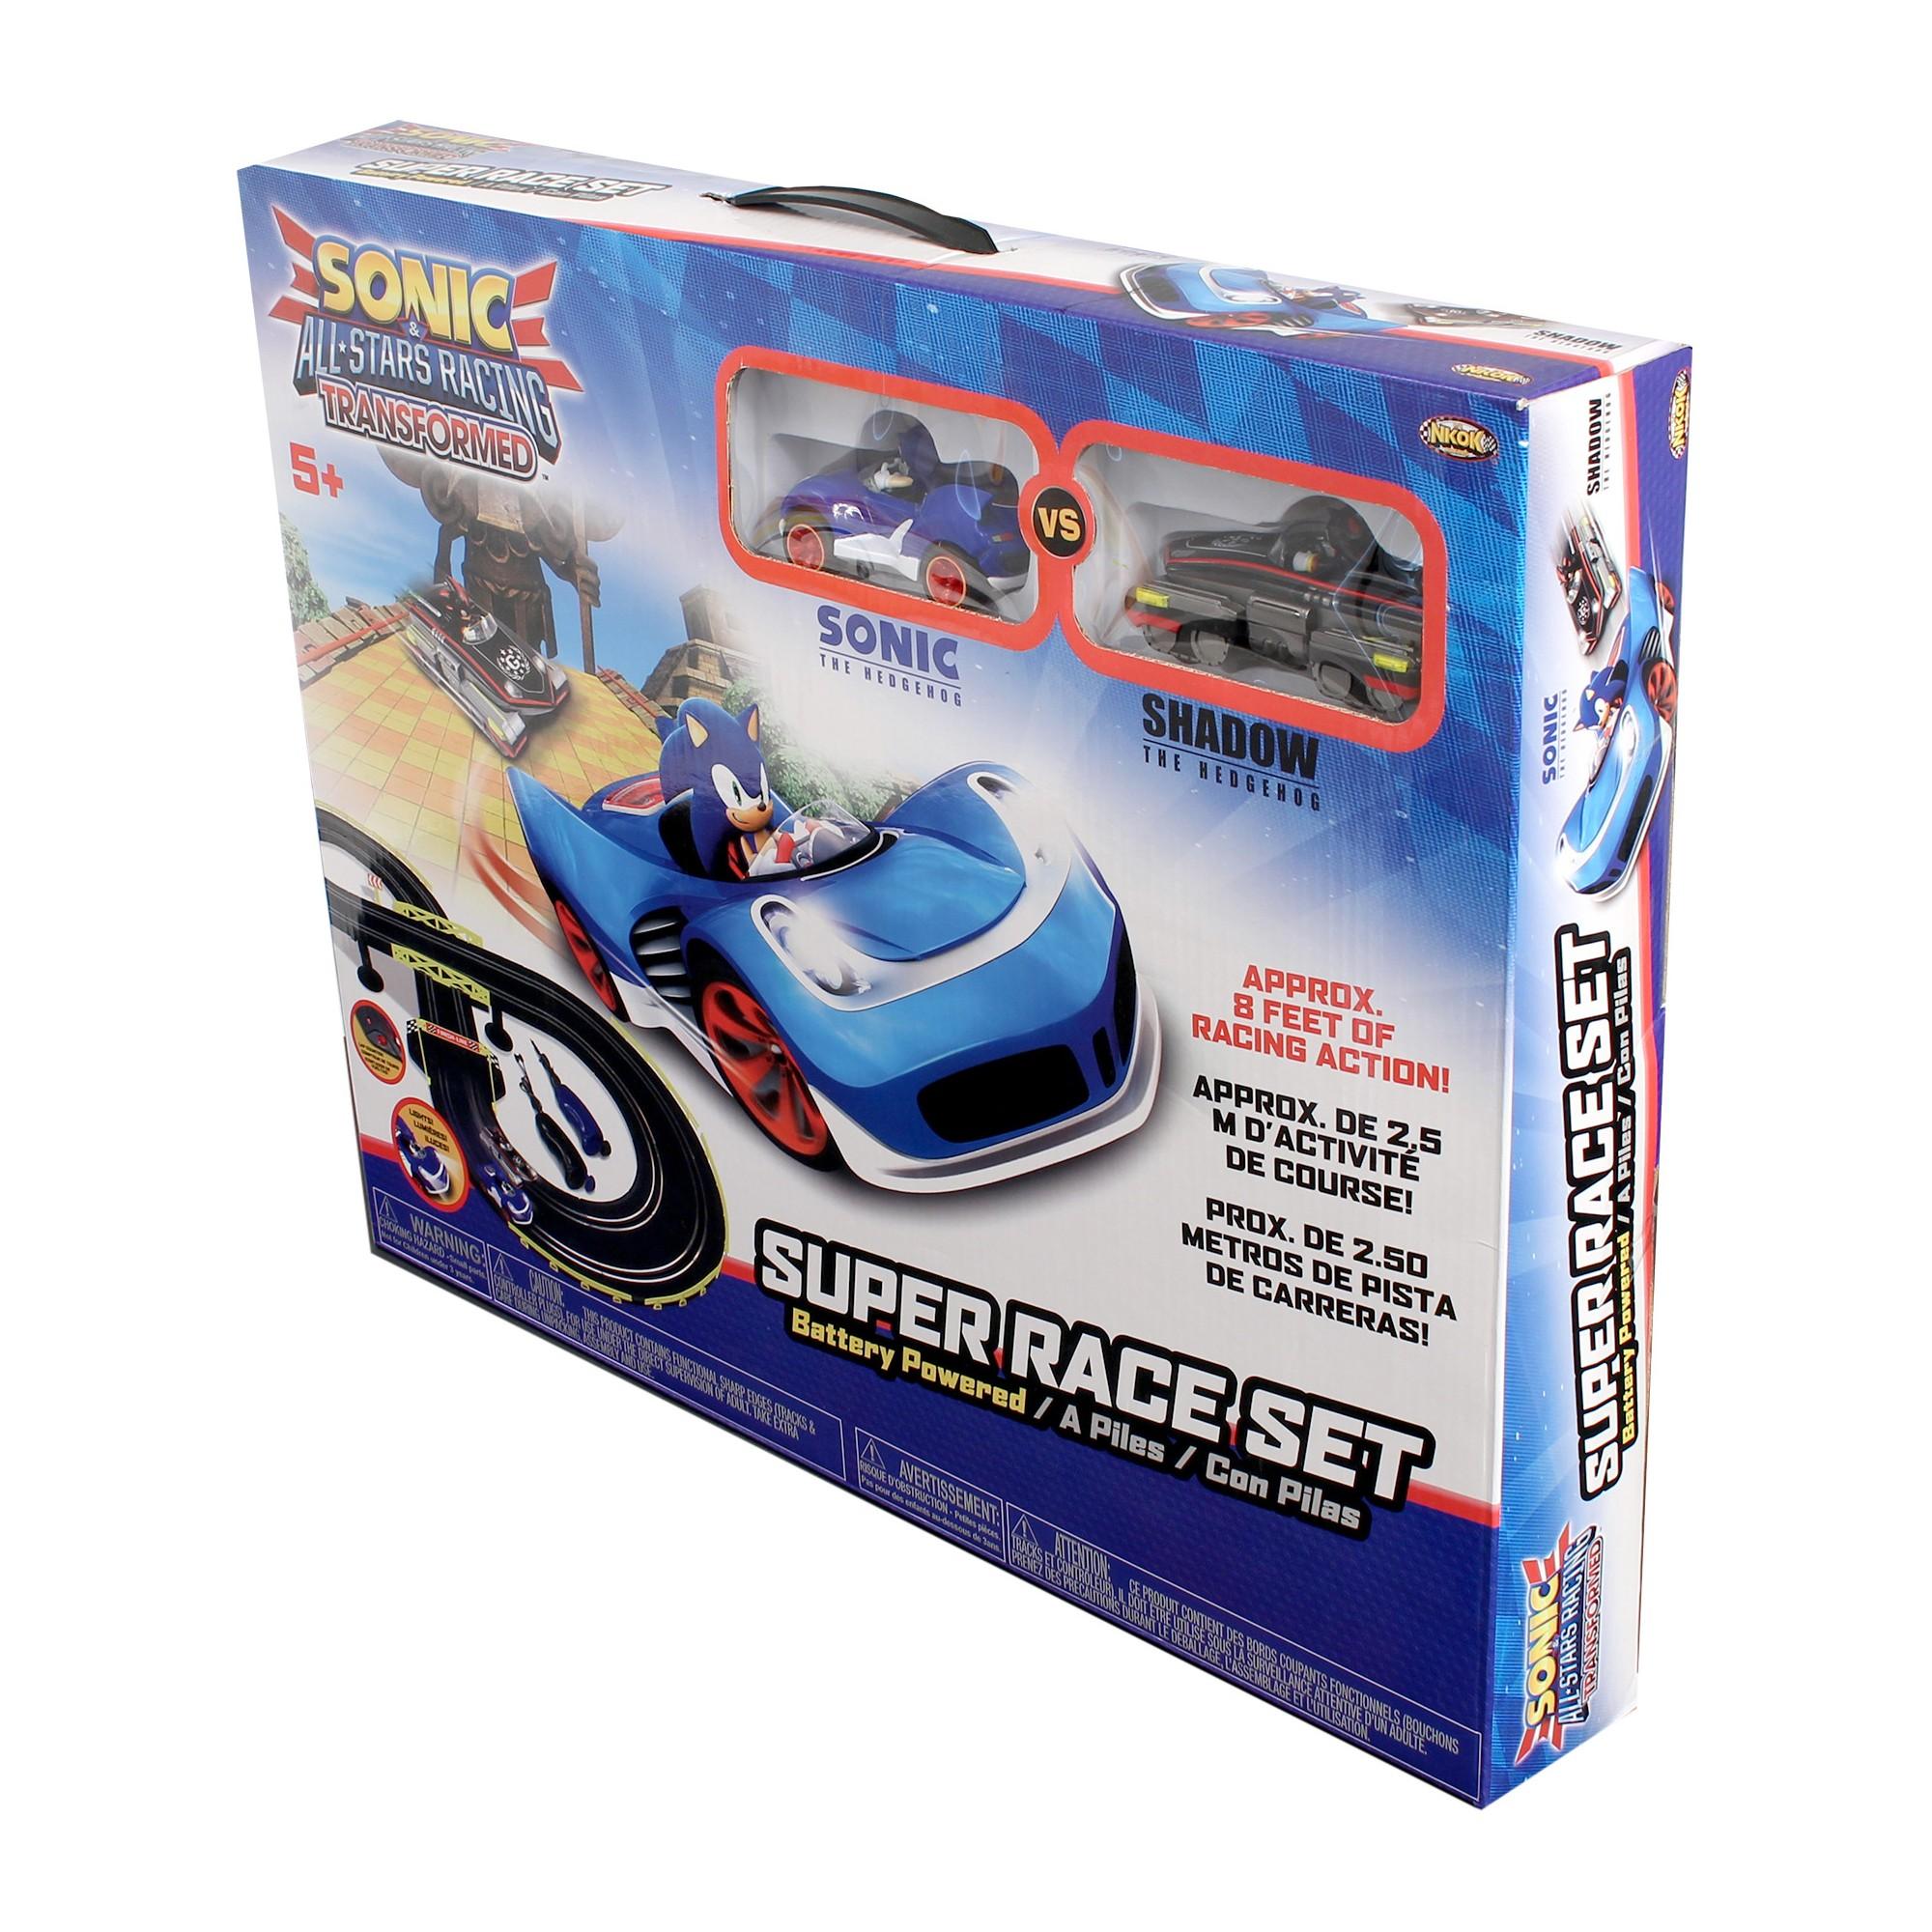 Nkok Rc Sonic The Hedgehog All Stars Racing Transformed Slot Slot Car Sets Sonic Shadow Racing